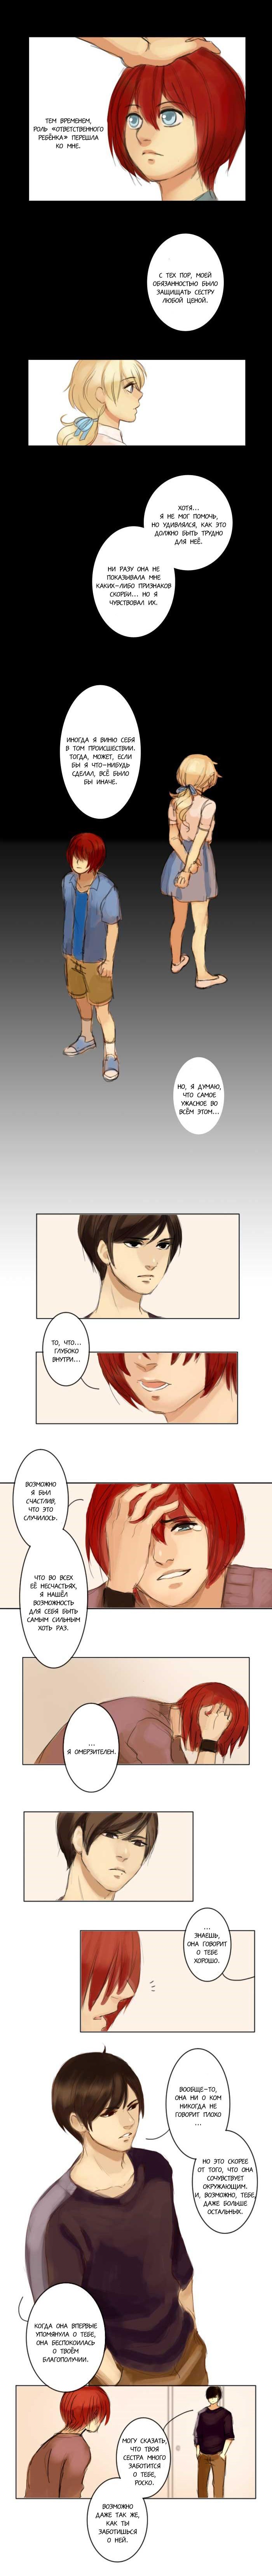 https://r1.ninemanga.com/comics/pic2/21/22485/269149/1437514924260.jpg Page 4